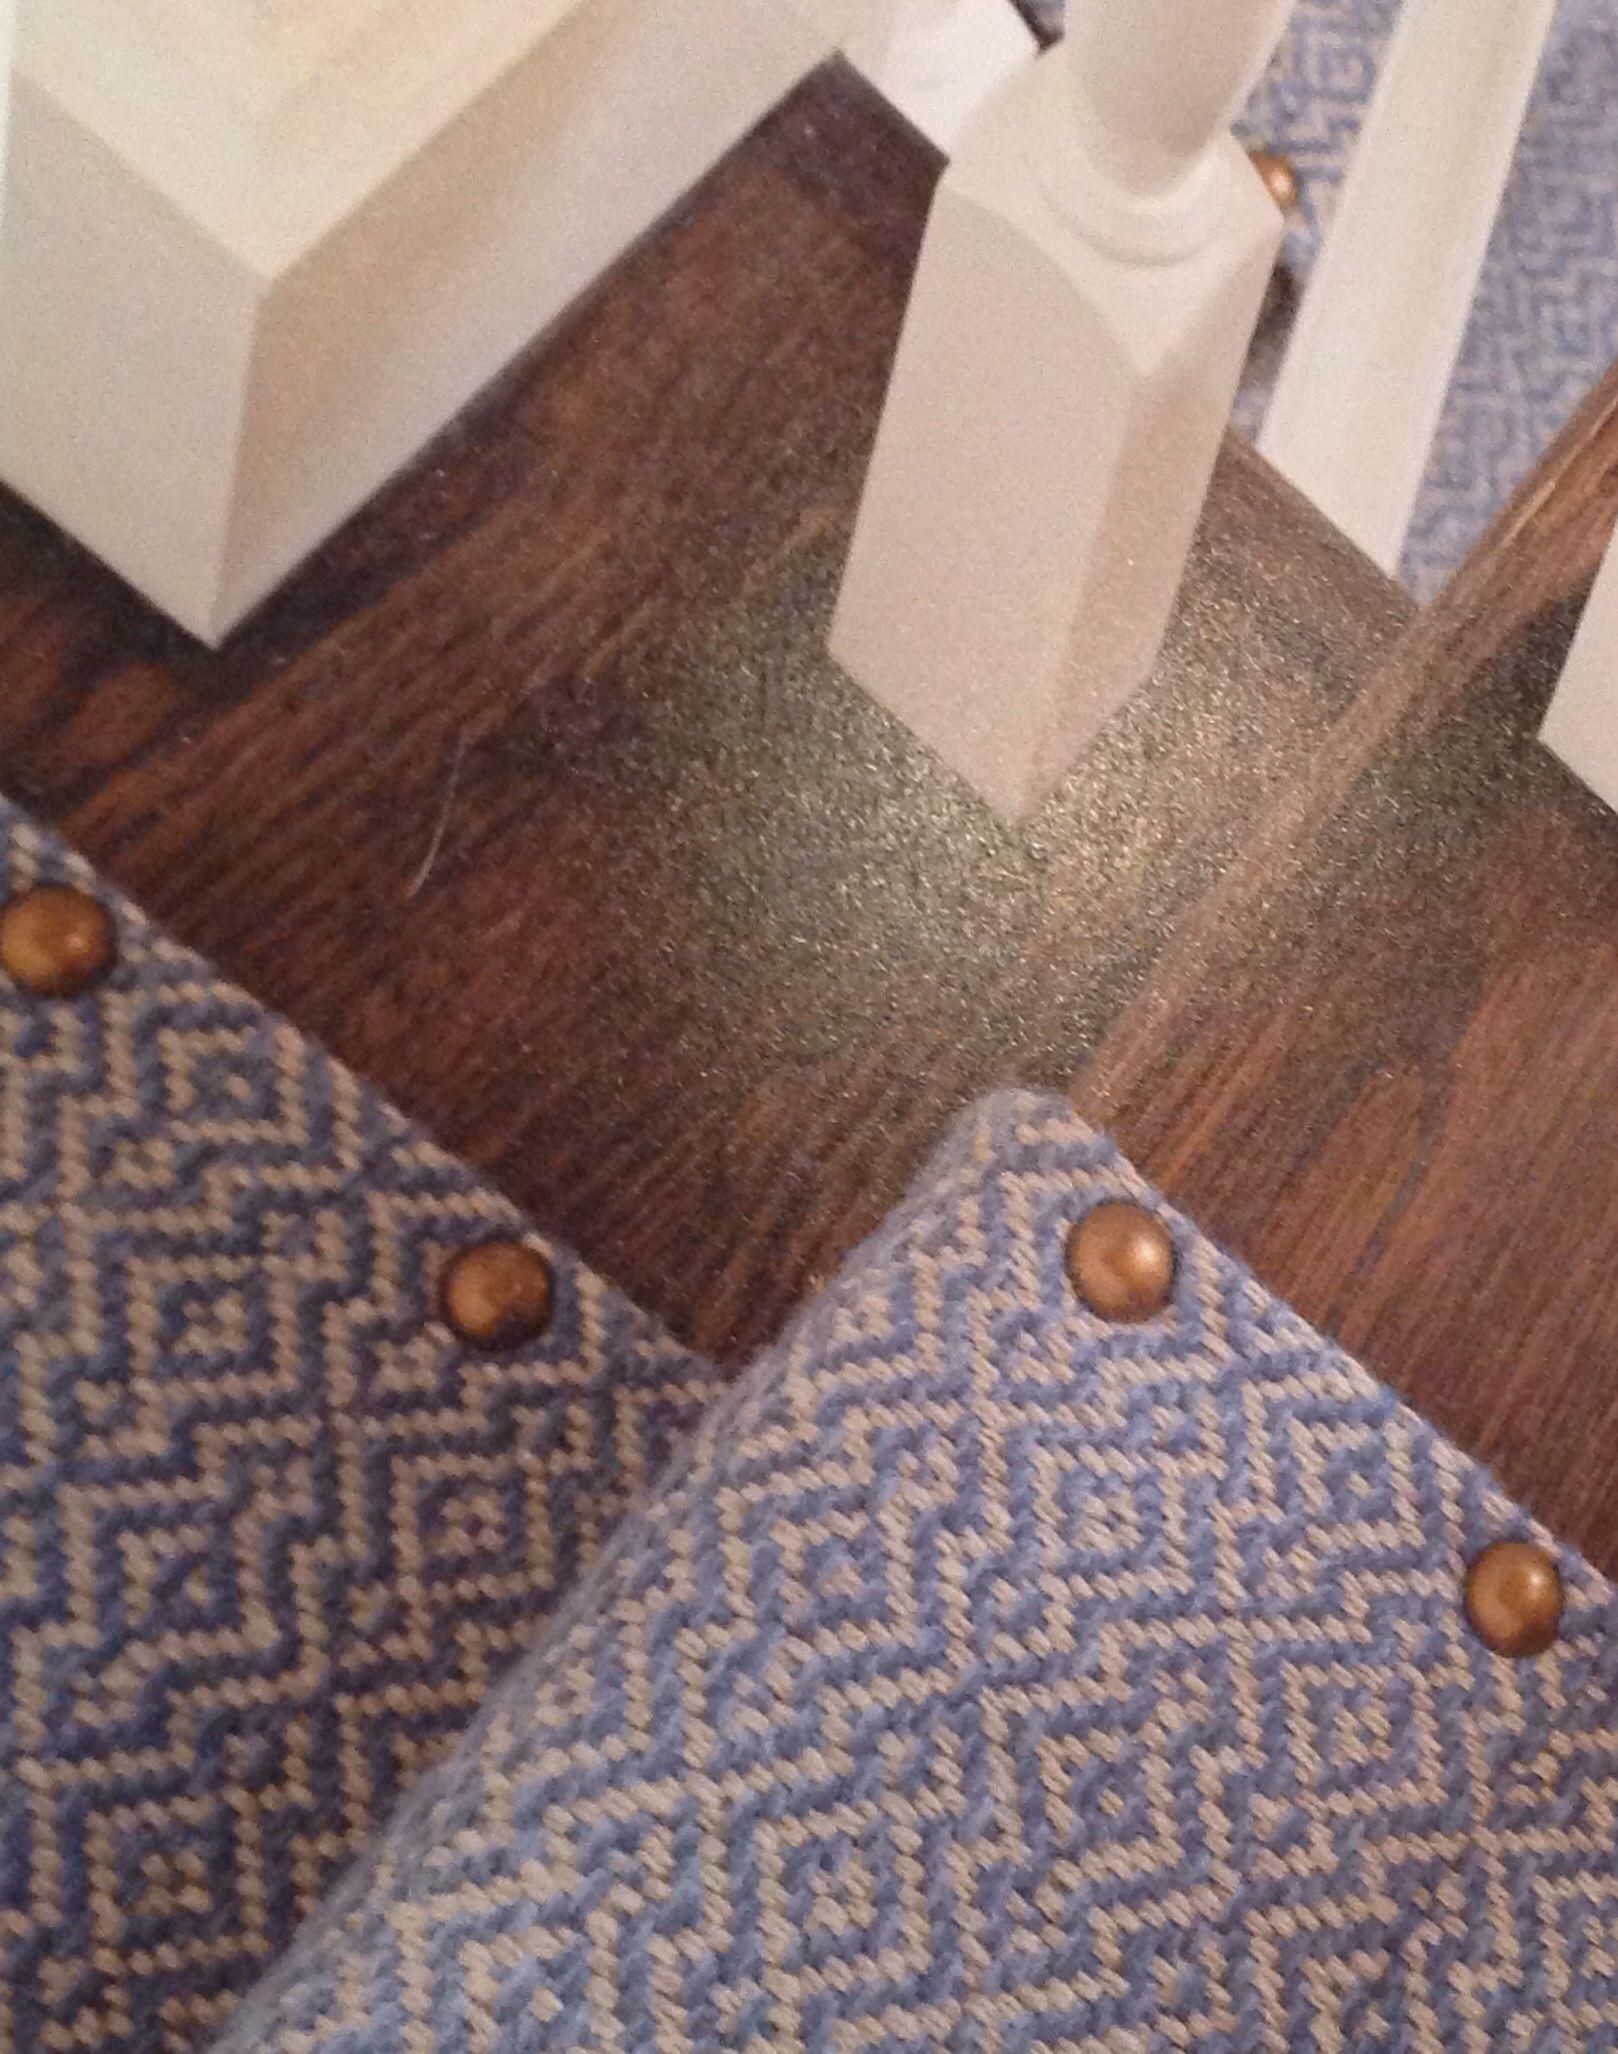 Upholstery Tacks Are Cute Elizabeth Eakins Flame Stitch Runner Credit Alexa Hampton More Stair Runner Carpet Hallway Carpet Runners Diy Carpet